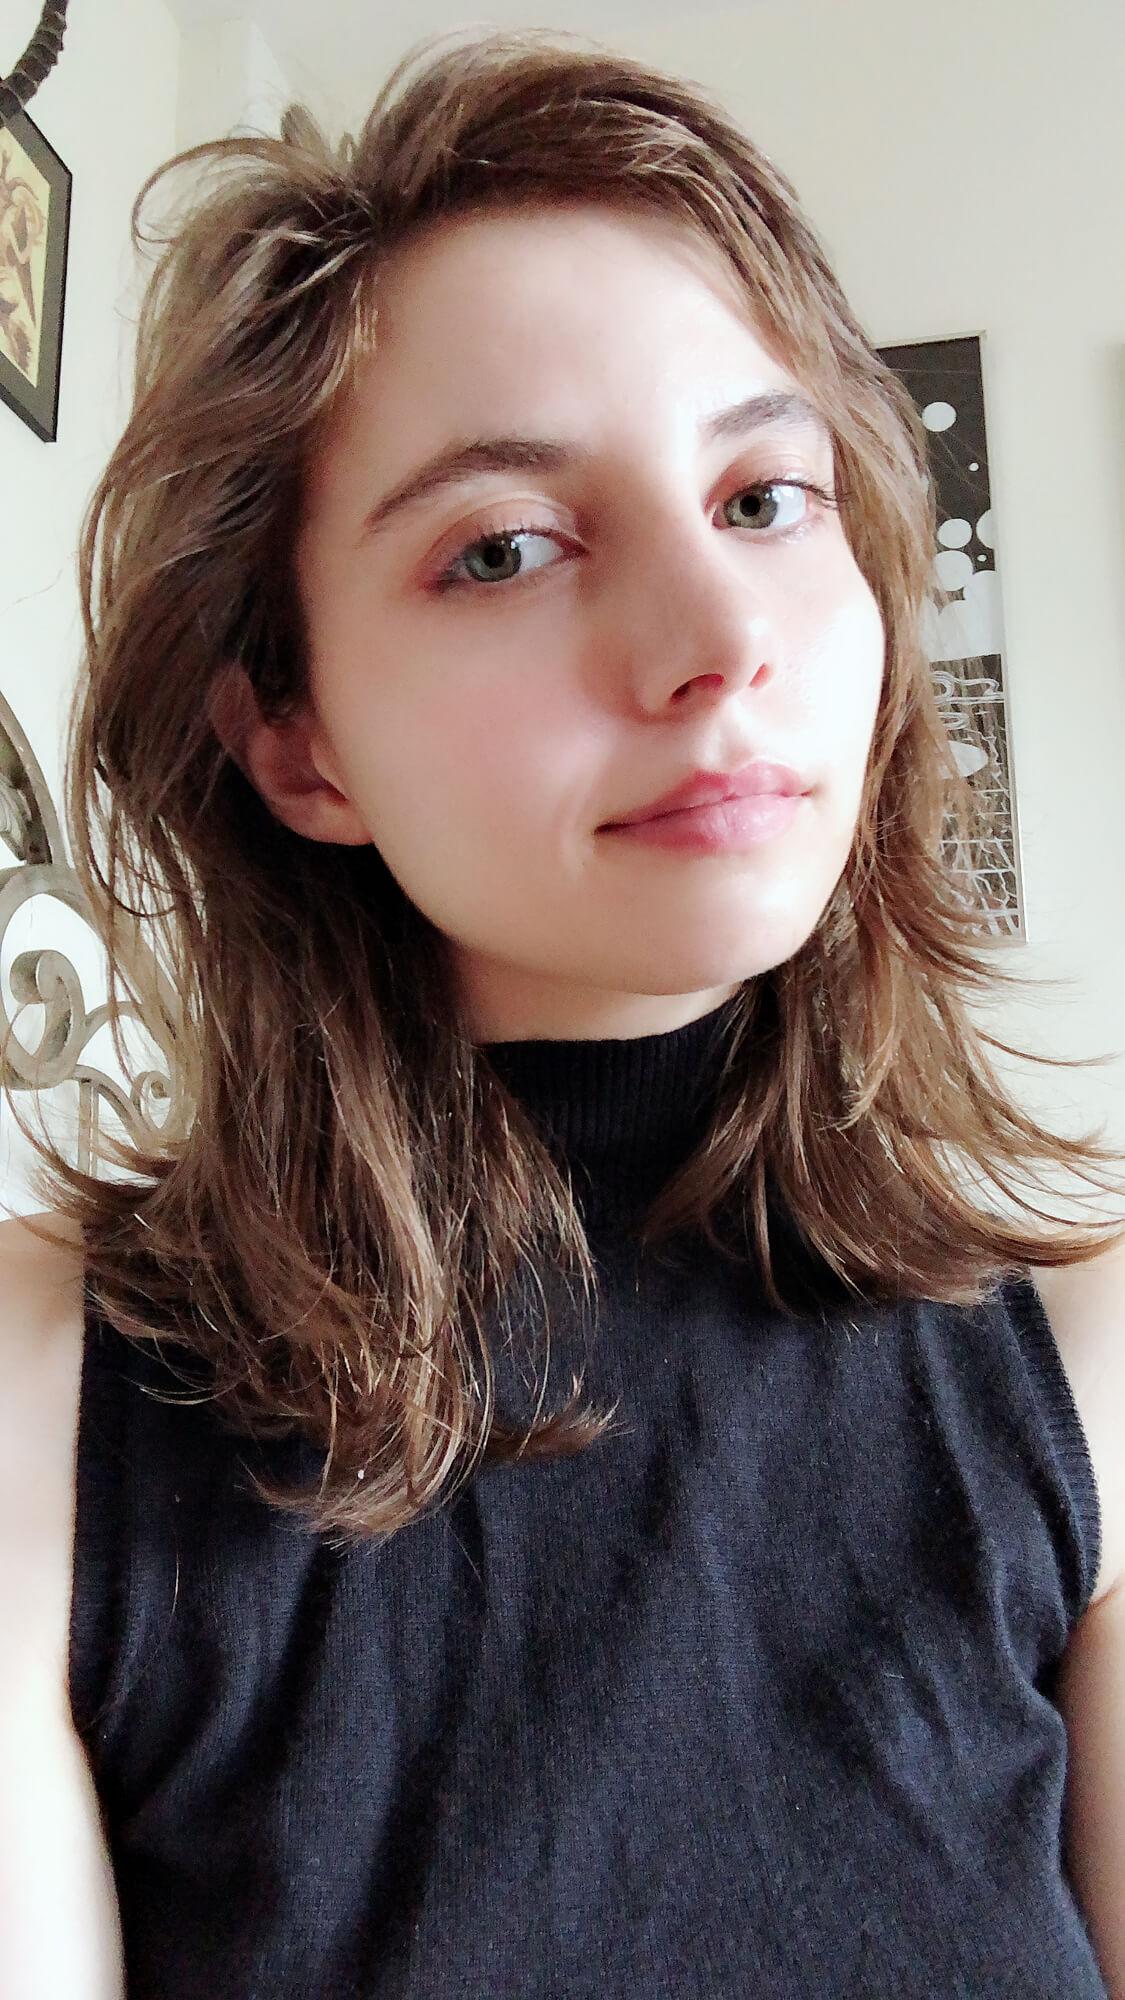 https://liararoux.xxx/wp-content/uploads/2018/10/Liara-Roux-Selfies-and-Snapshots-September-2018-019.jpg